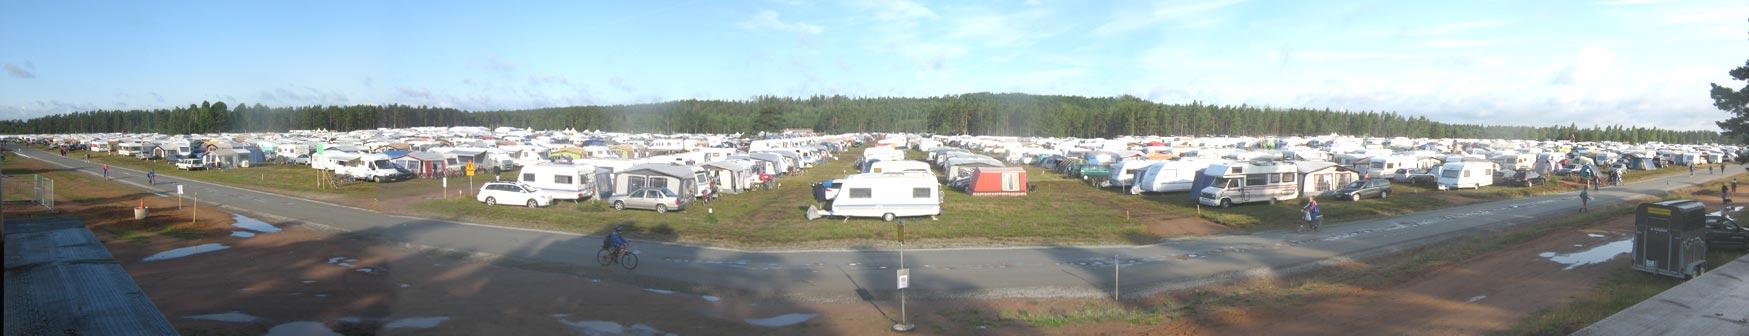 Caravan-camp